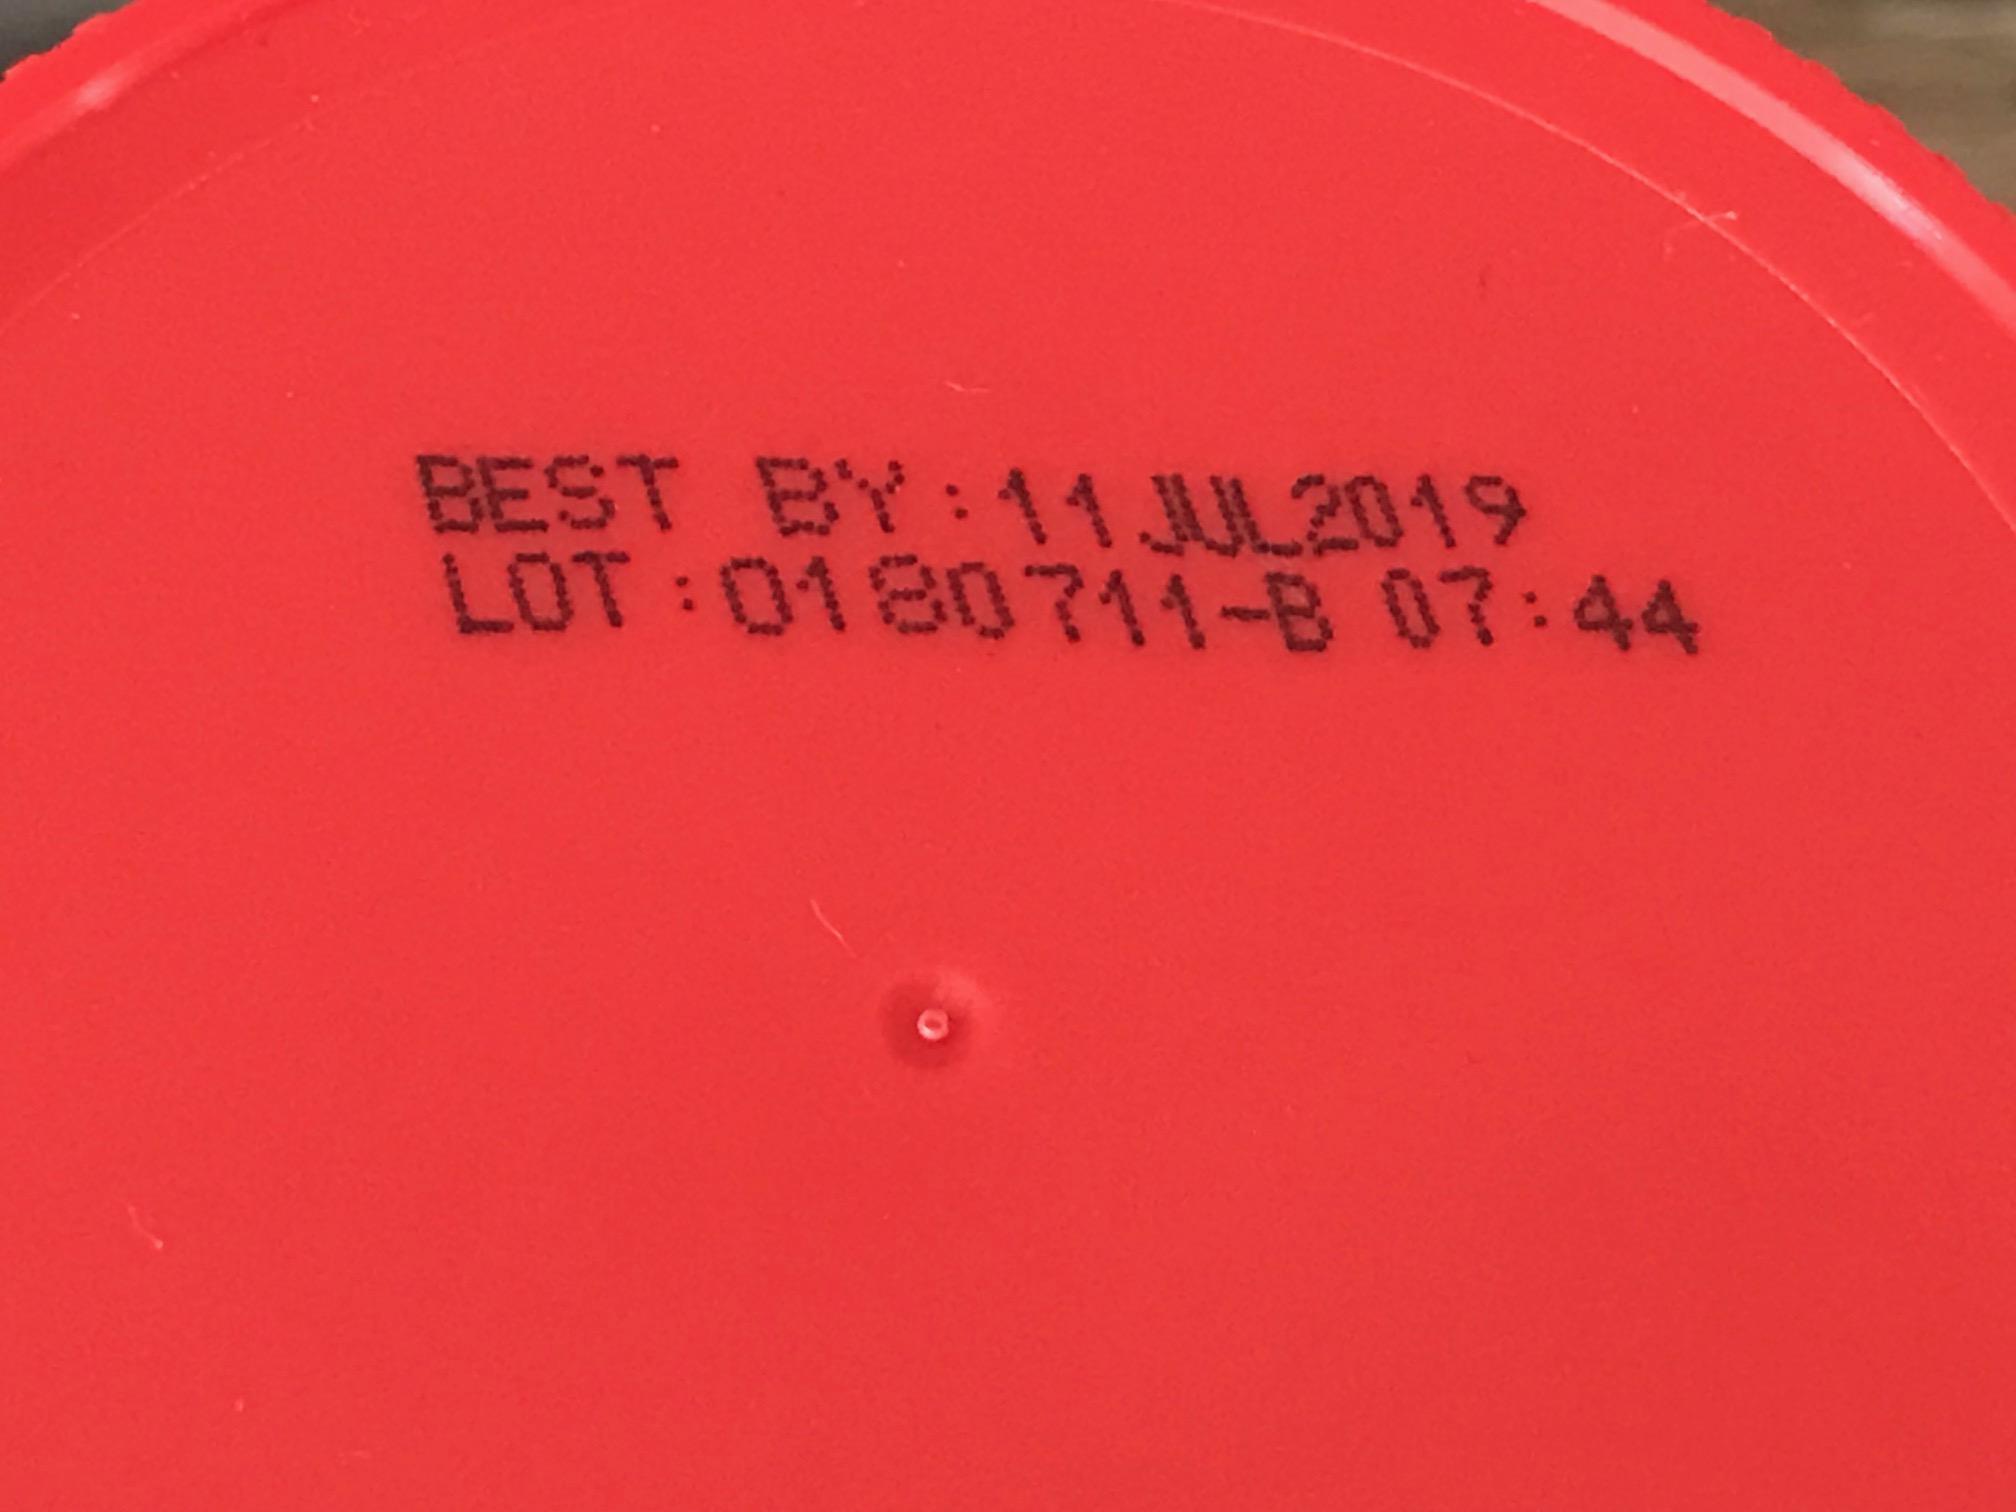 Antimony Found in Kirkland (Costco) Organic Peanut Butter Plastic Jars